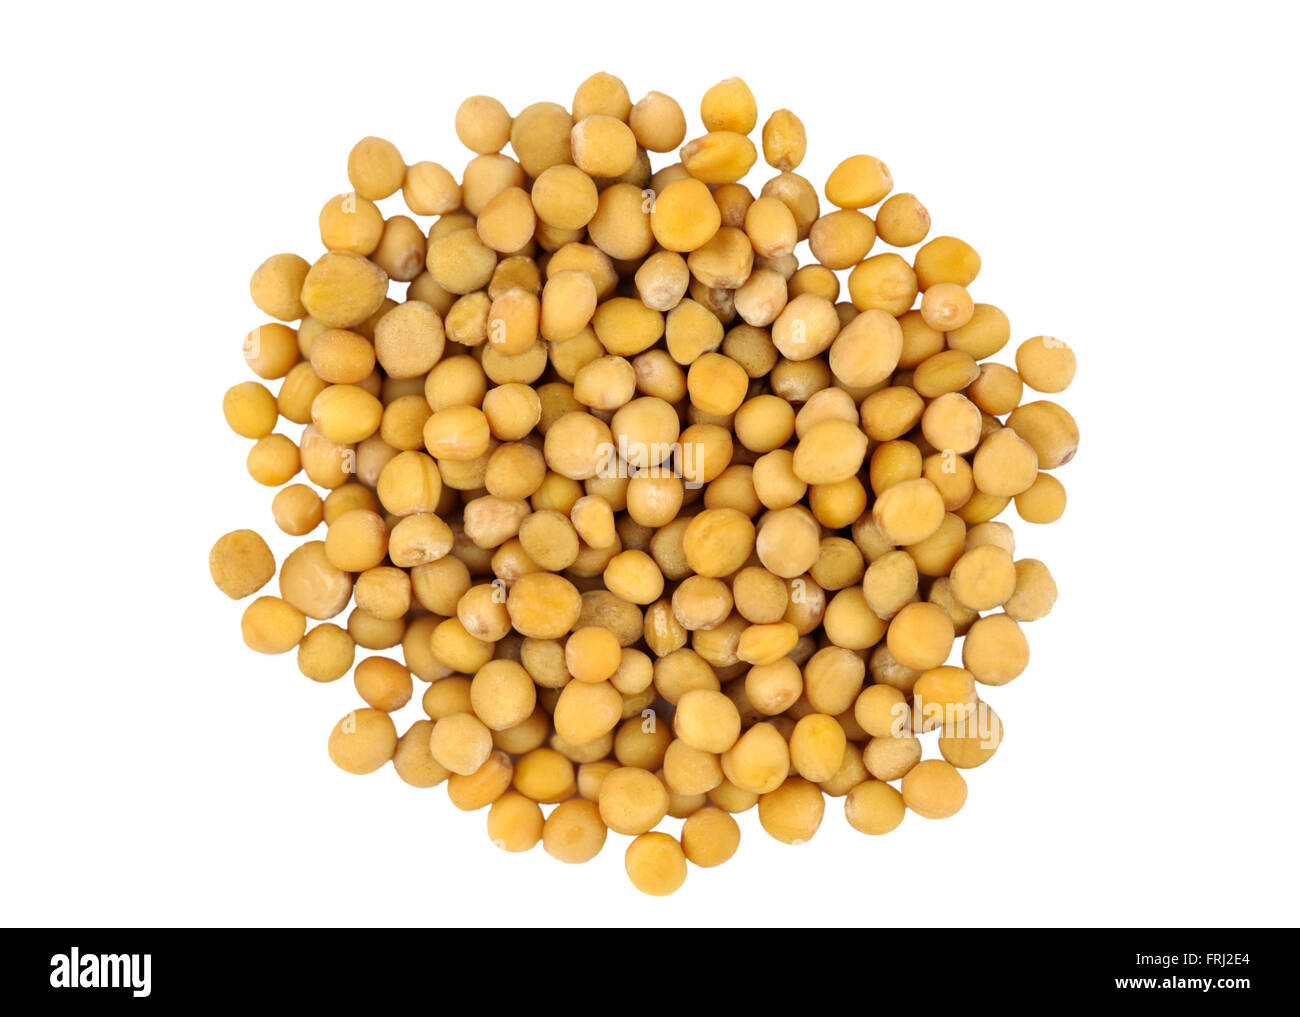 Yellow Mustard seeds also called White Mustard, Sinapis Alba, Brassica Alba or Brassica Hirta. - Stock Image